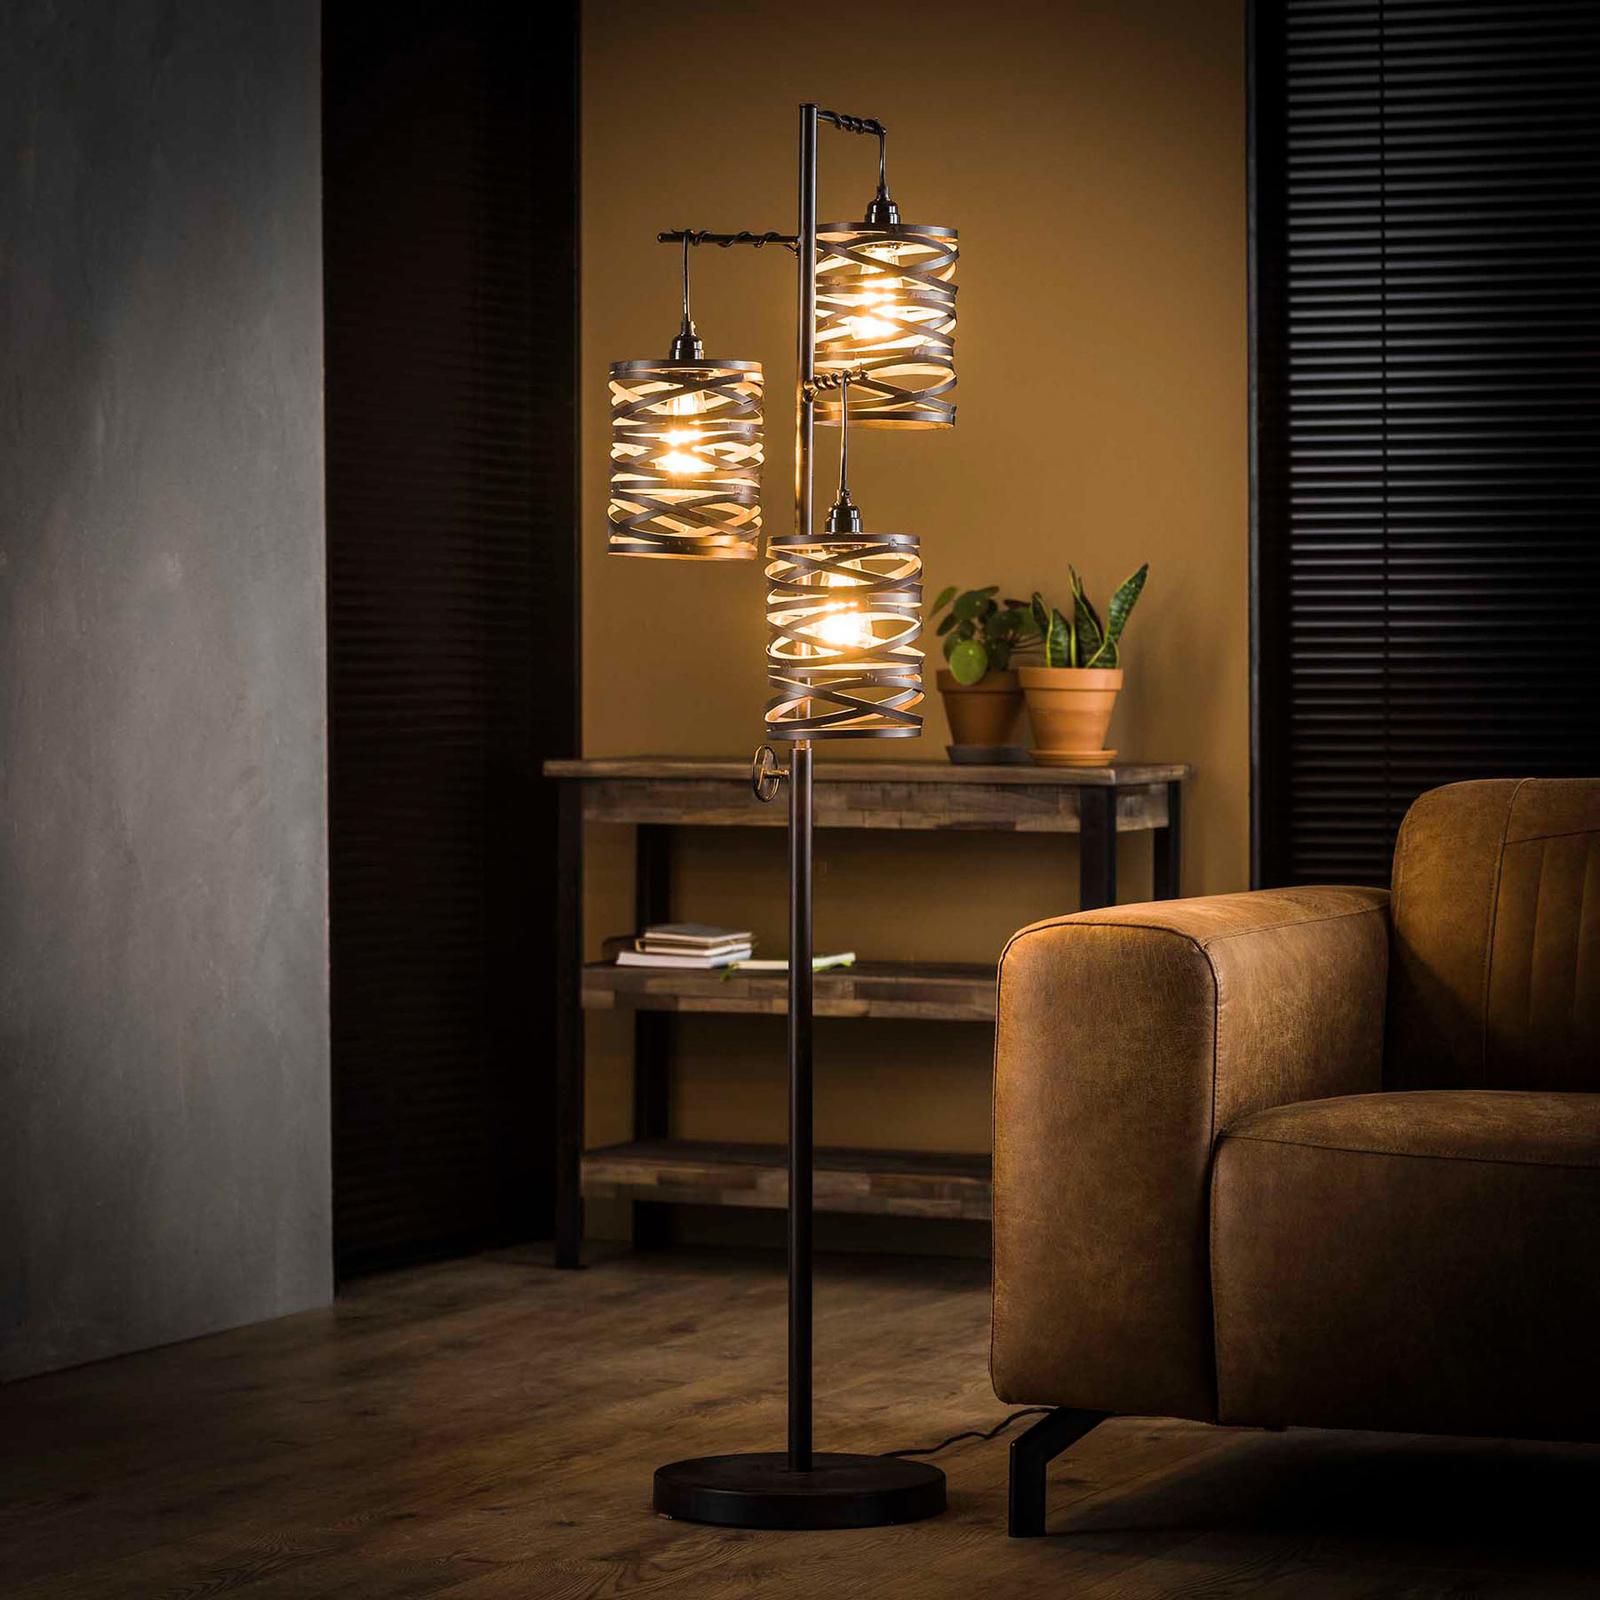 Pöytälamppu Spindlight, 3-lamppuinen, kork. 150 cm